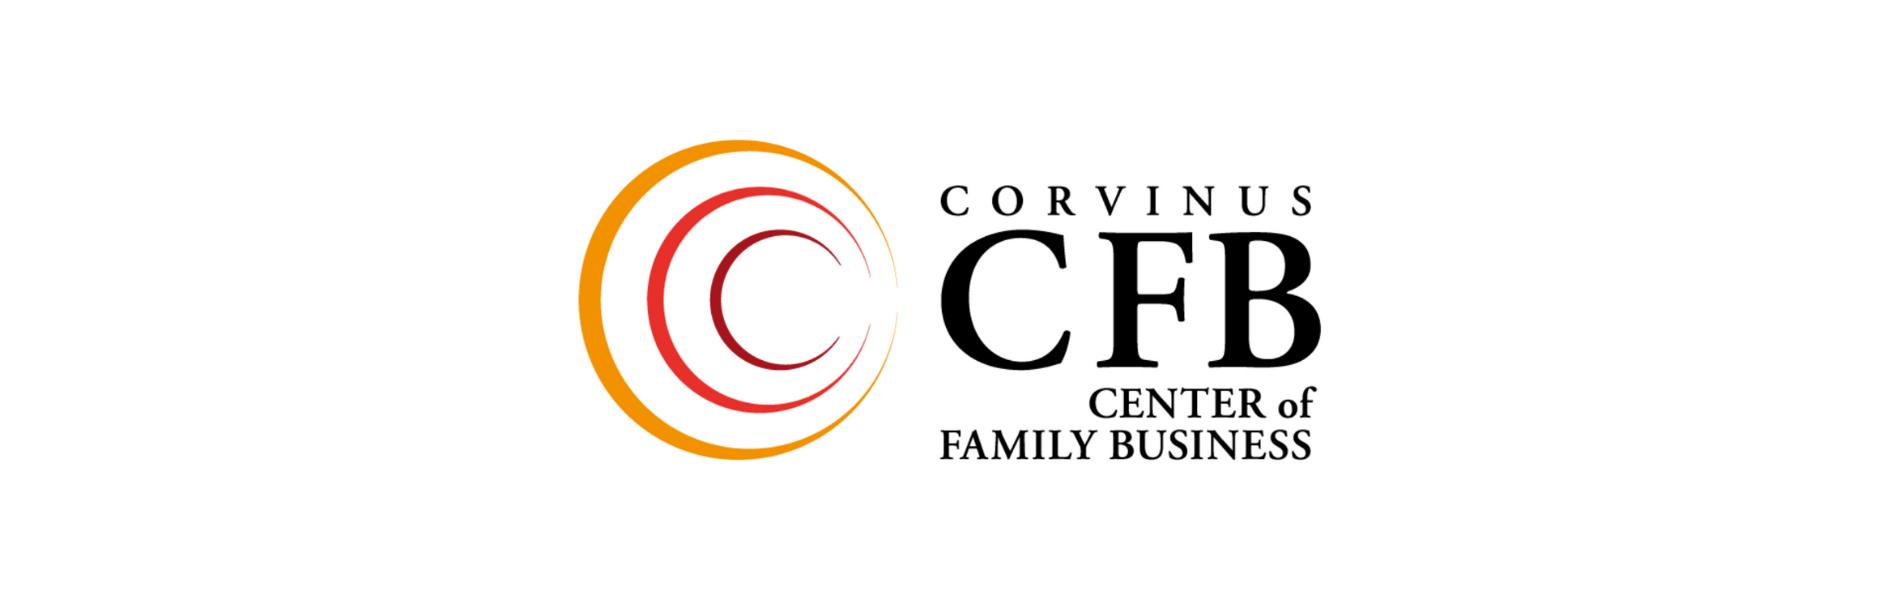 Corvinus Centre of Family Business